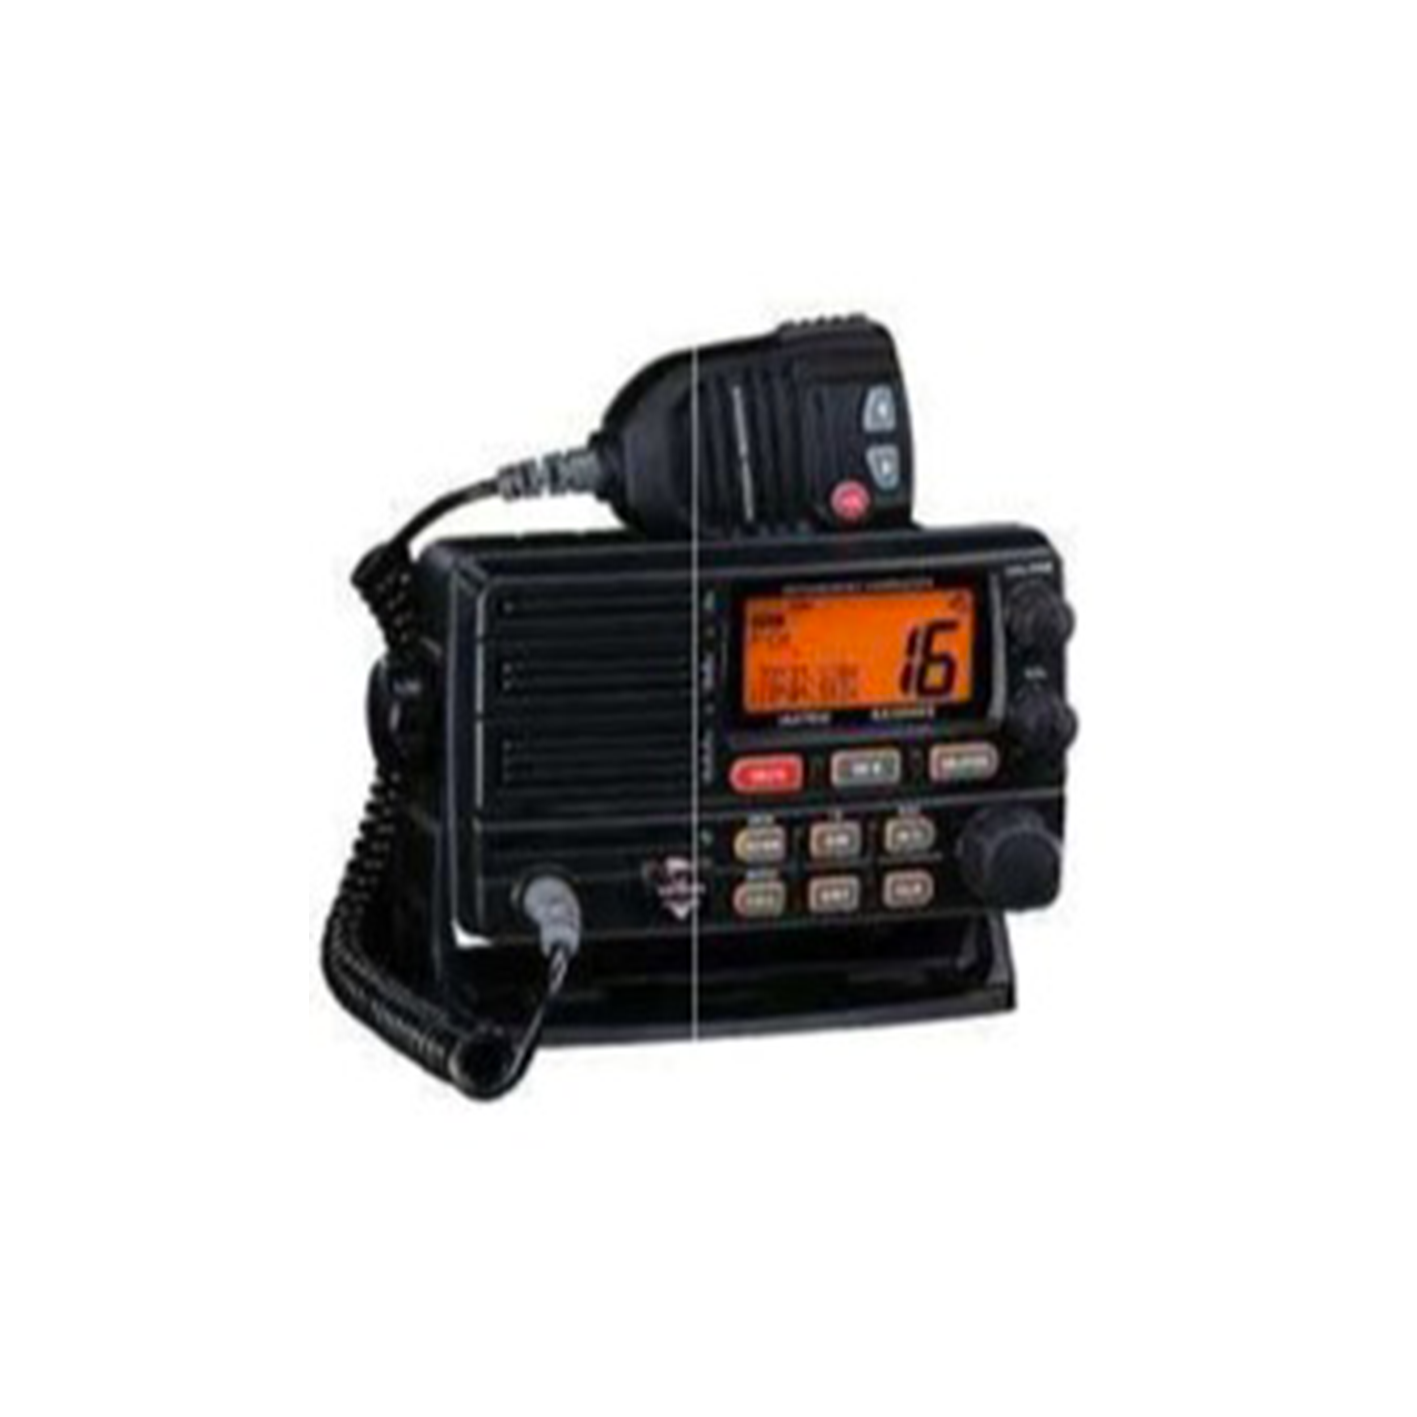 CRR (Certificat Restreint de Radiotéléphoniste)